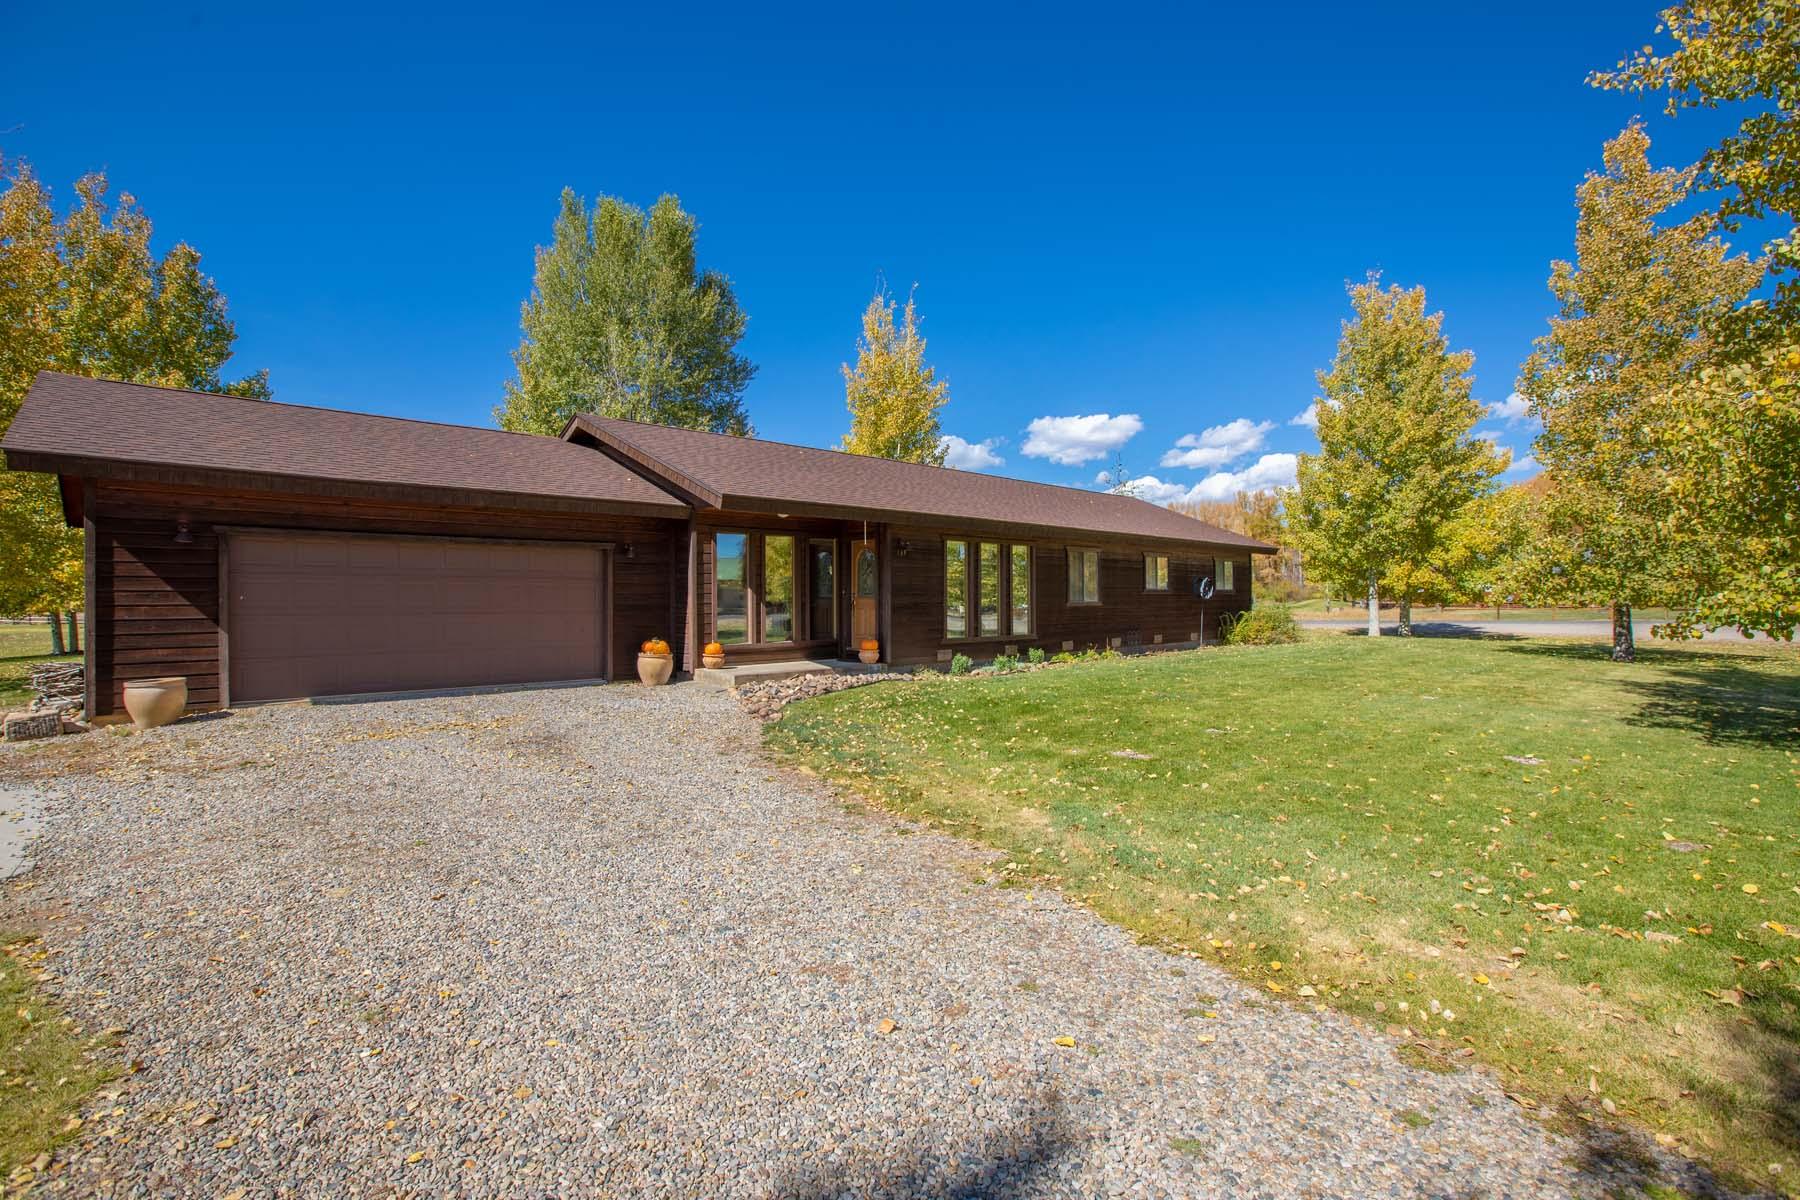 Single Family Homes for Active at Dos Rios Golf Course Home 733 Fairway Lane Gunnison, Colorado 81230 United States